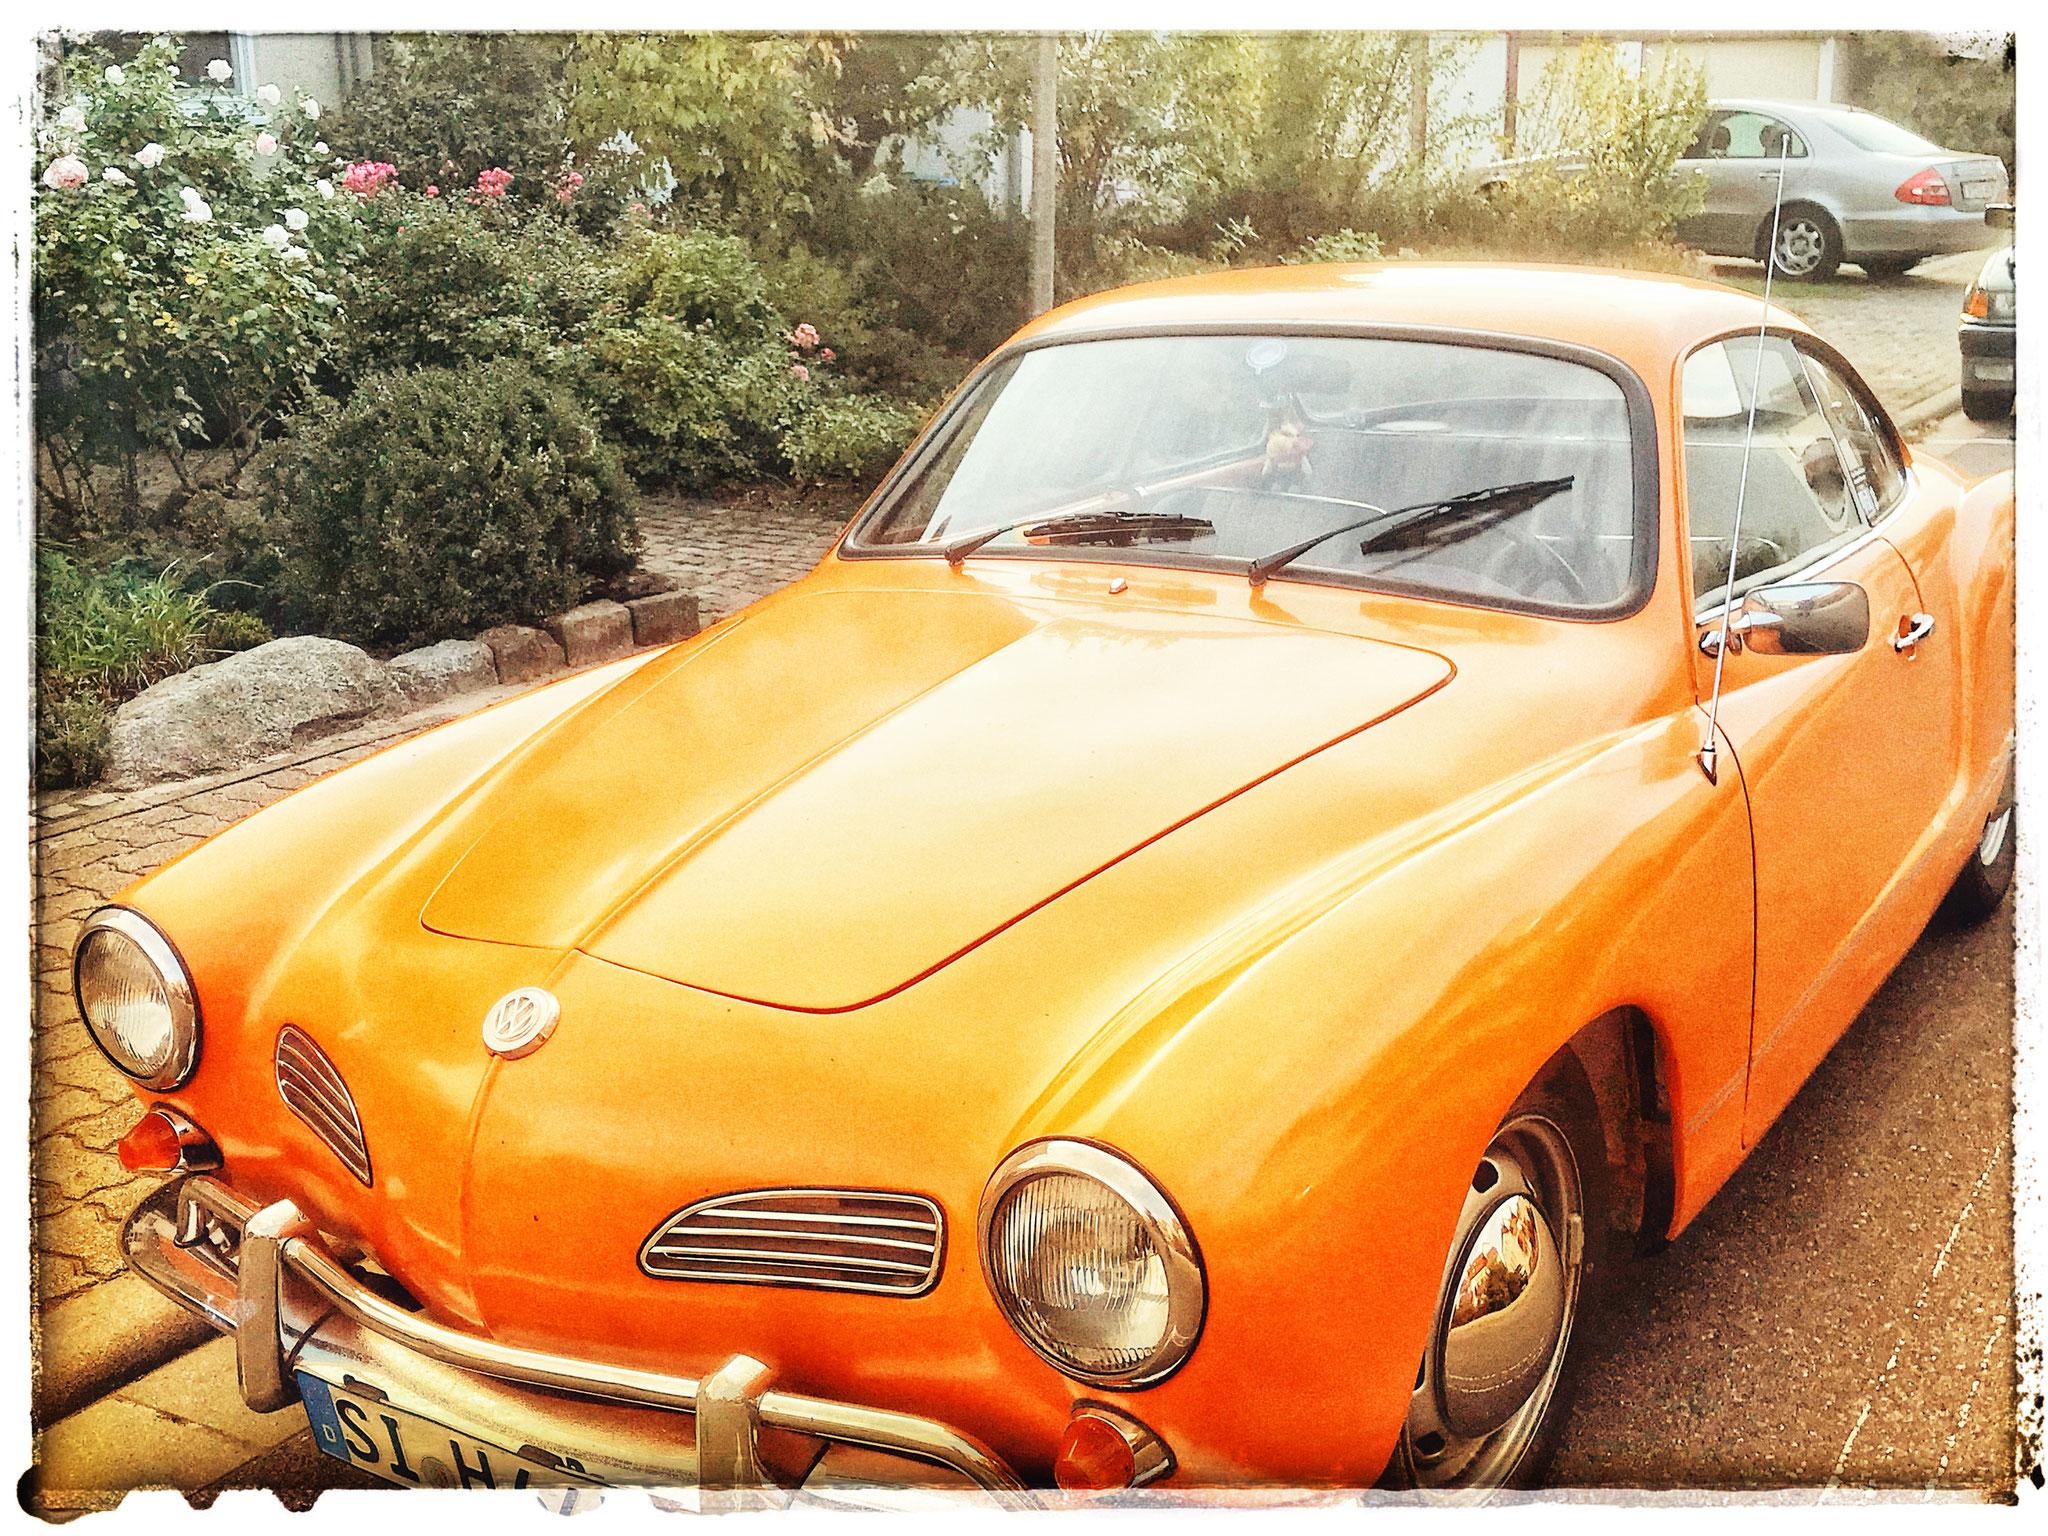 VW 1505 Kharmann Ghia in Orange. Carspotting Speyer